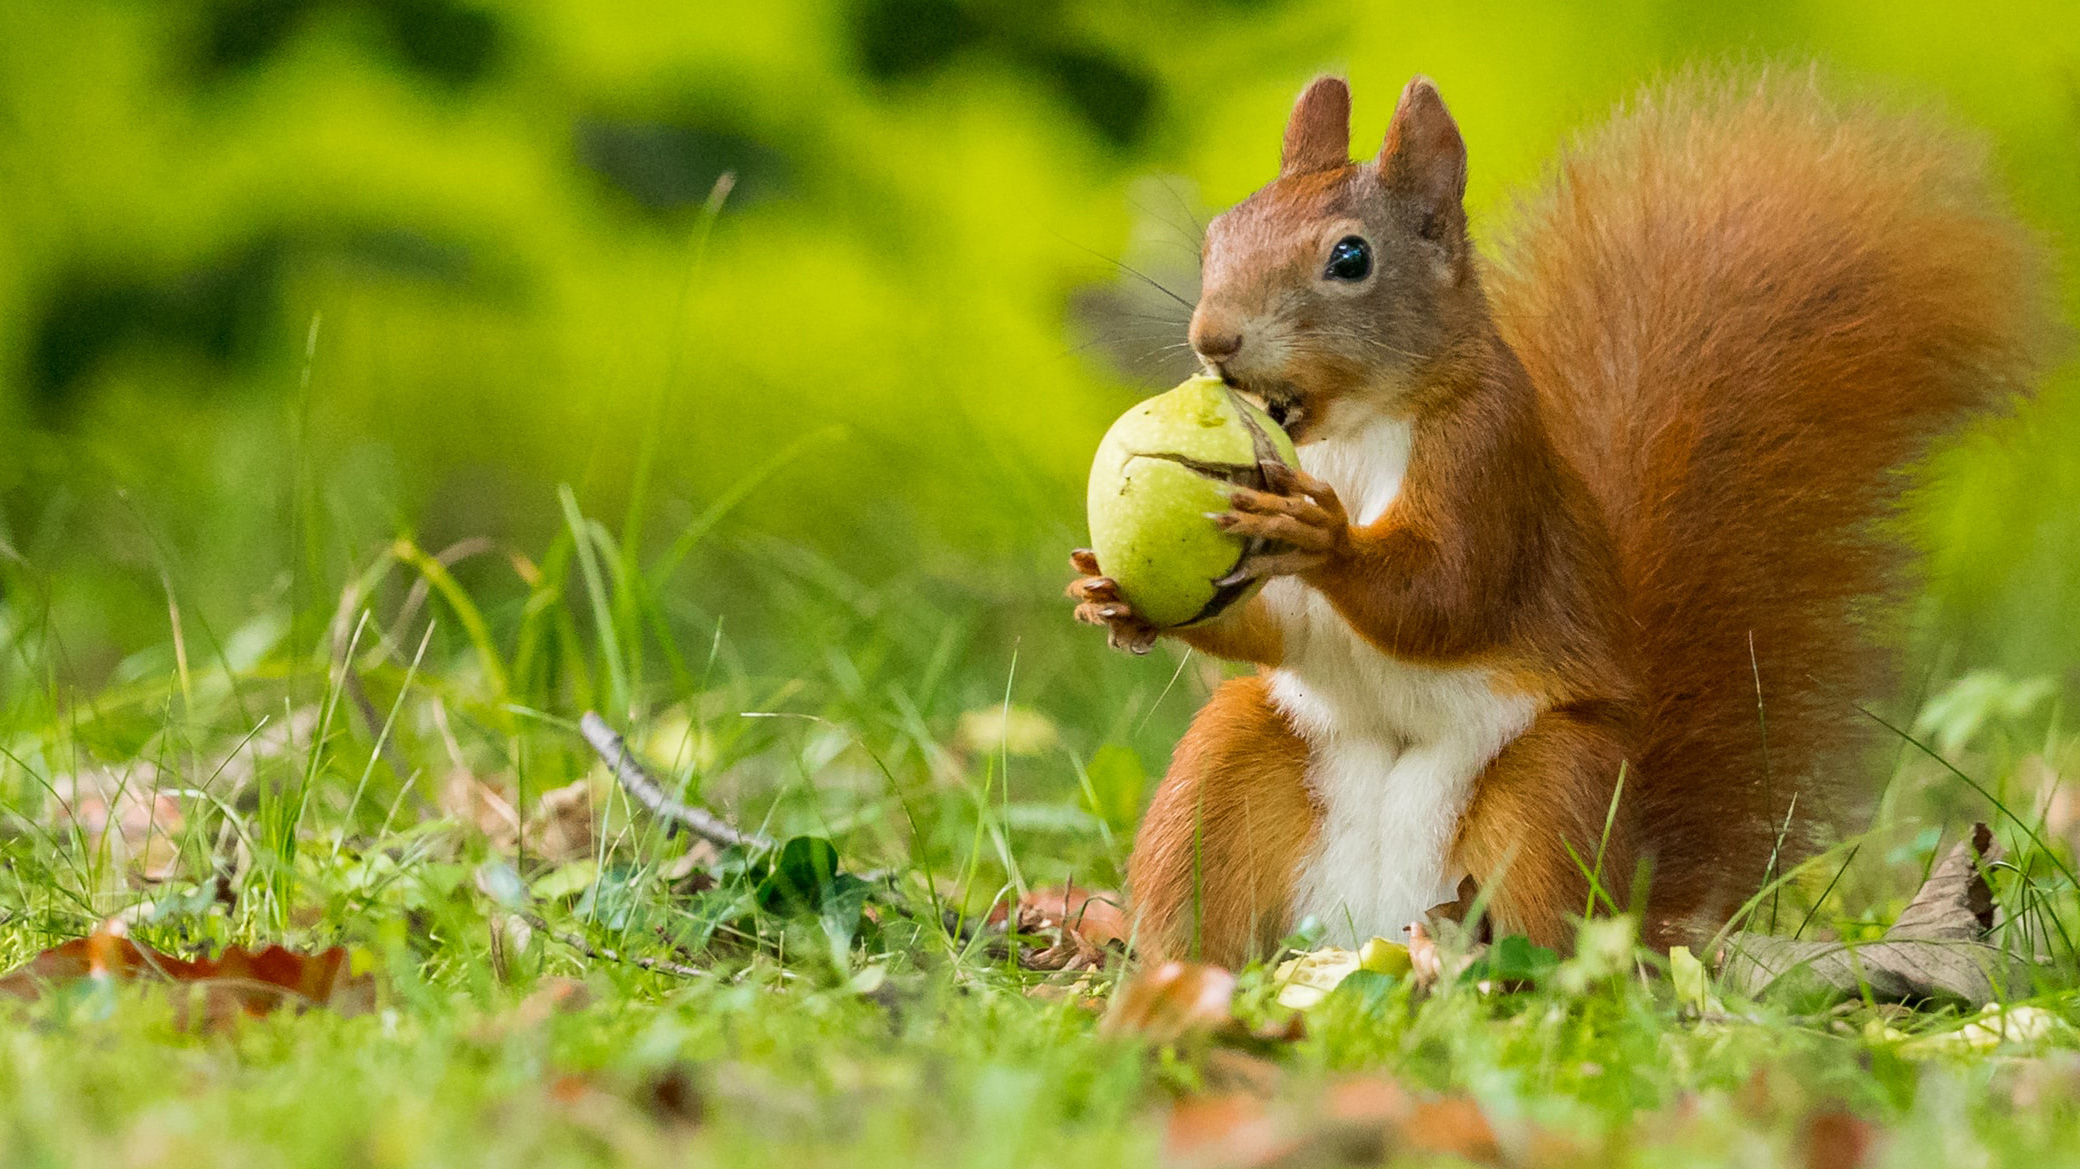 A squirrel holding a nut in the Czech Republic